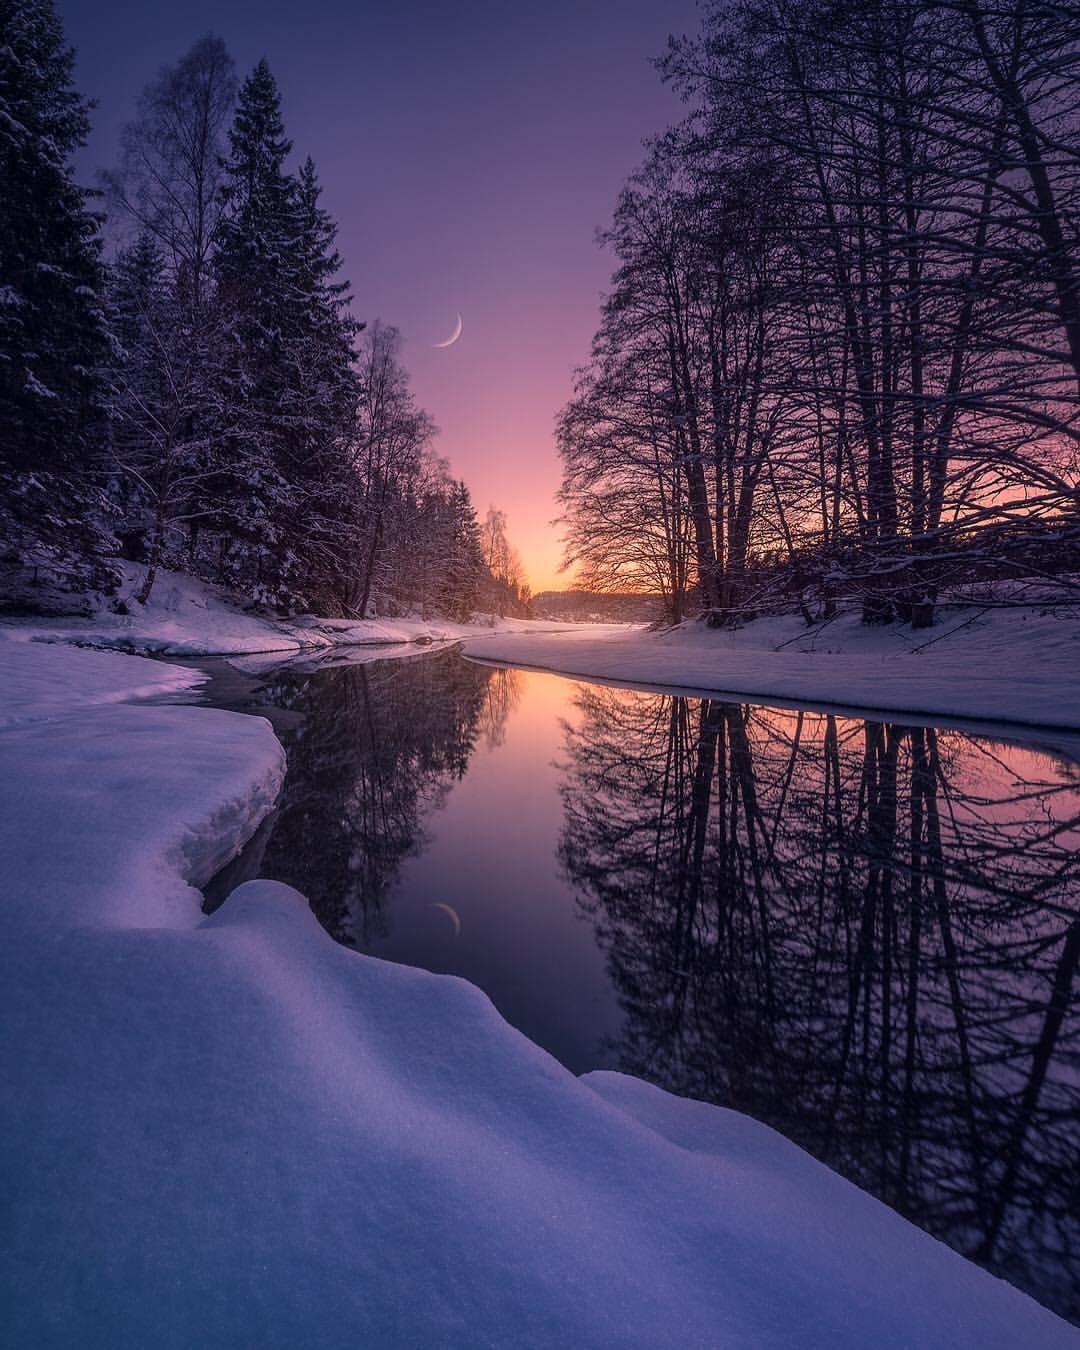 Hans Gunnar Aslaksen Is A Multi Talented Photographer Graphic Designe Landscape Photography Nature Winter Landscape Photography Mountain Landscape Photography